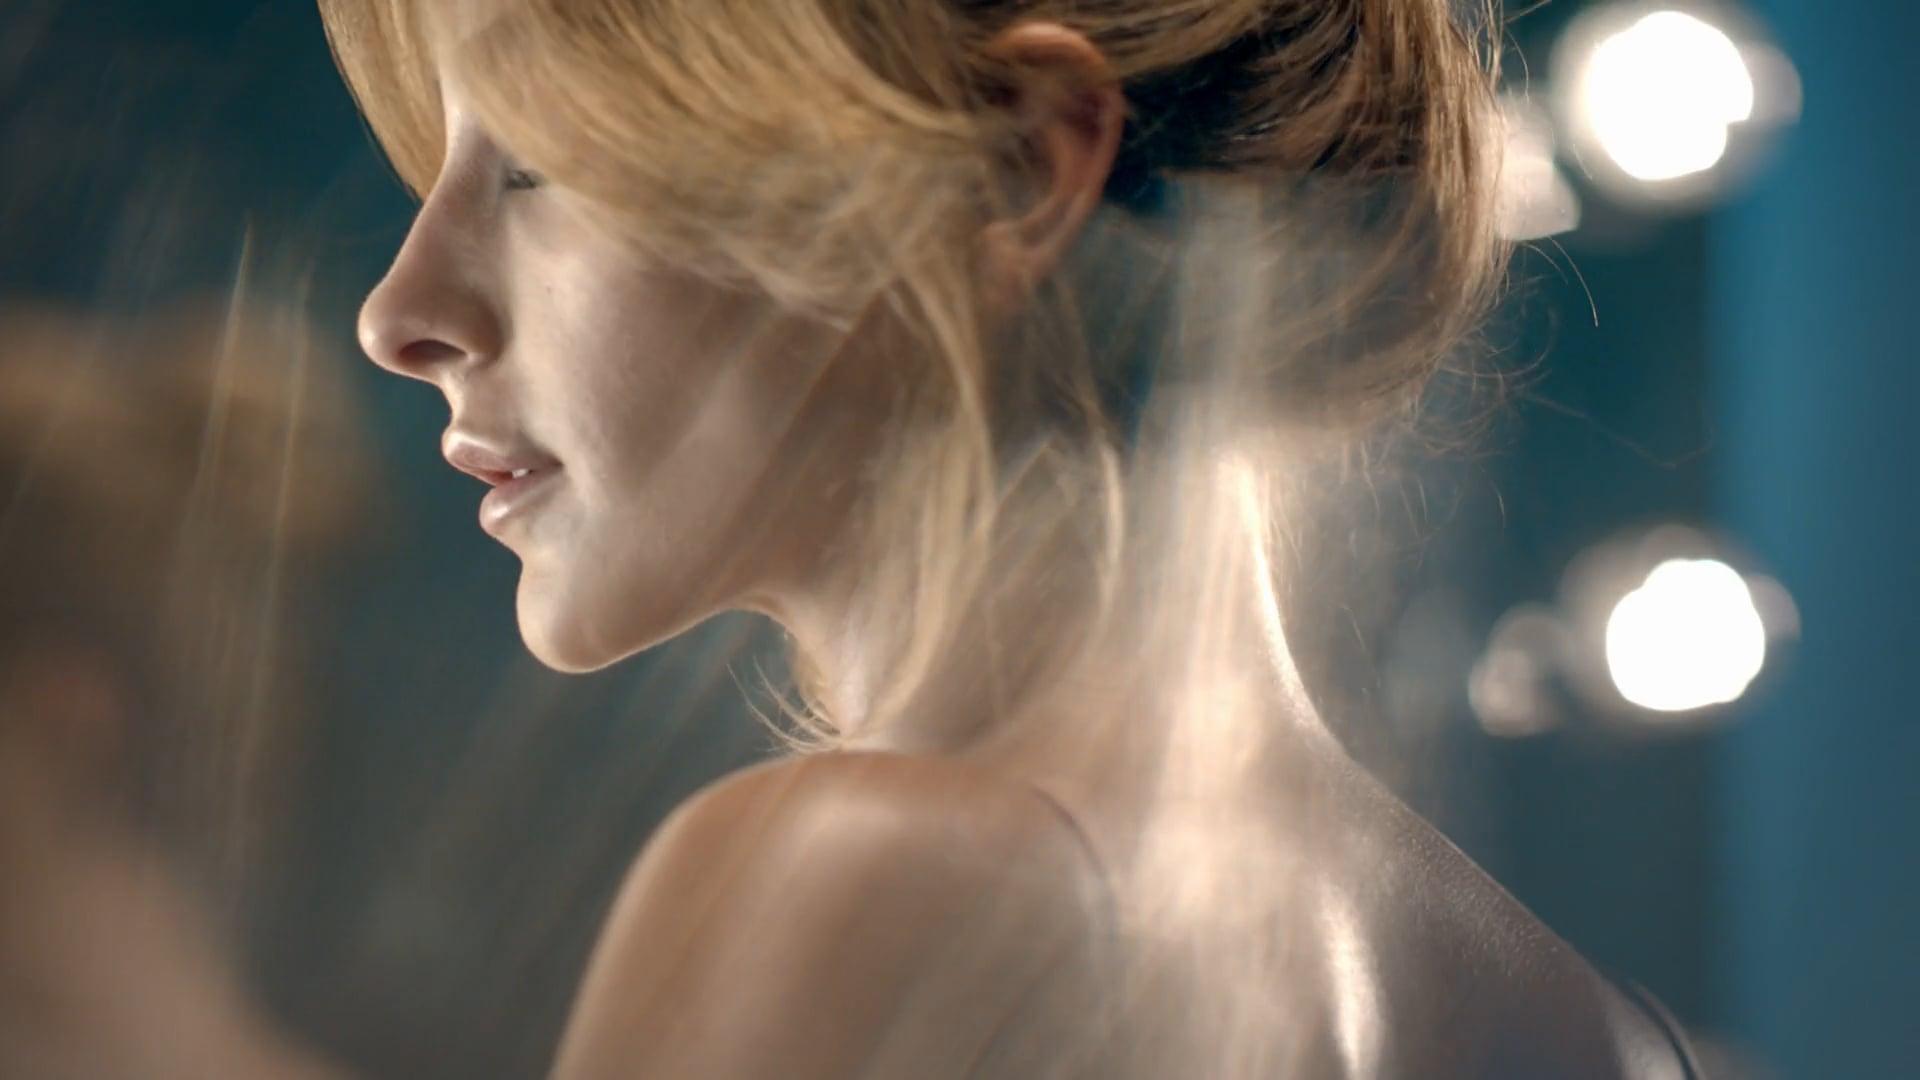 Emir Khalilzadeh-Note Cosmetics Tv Commercial